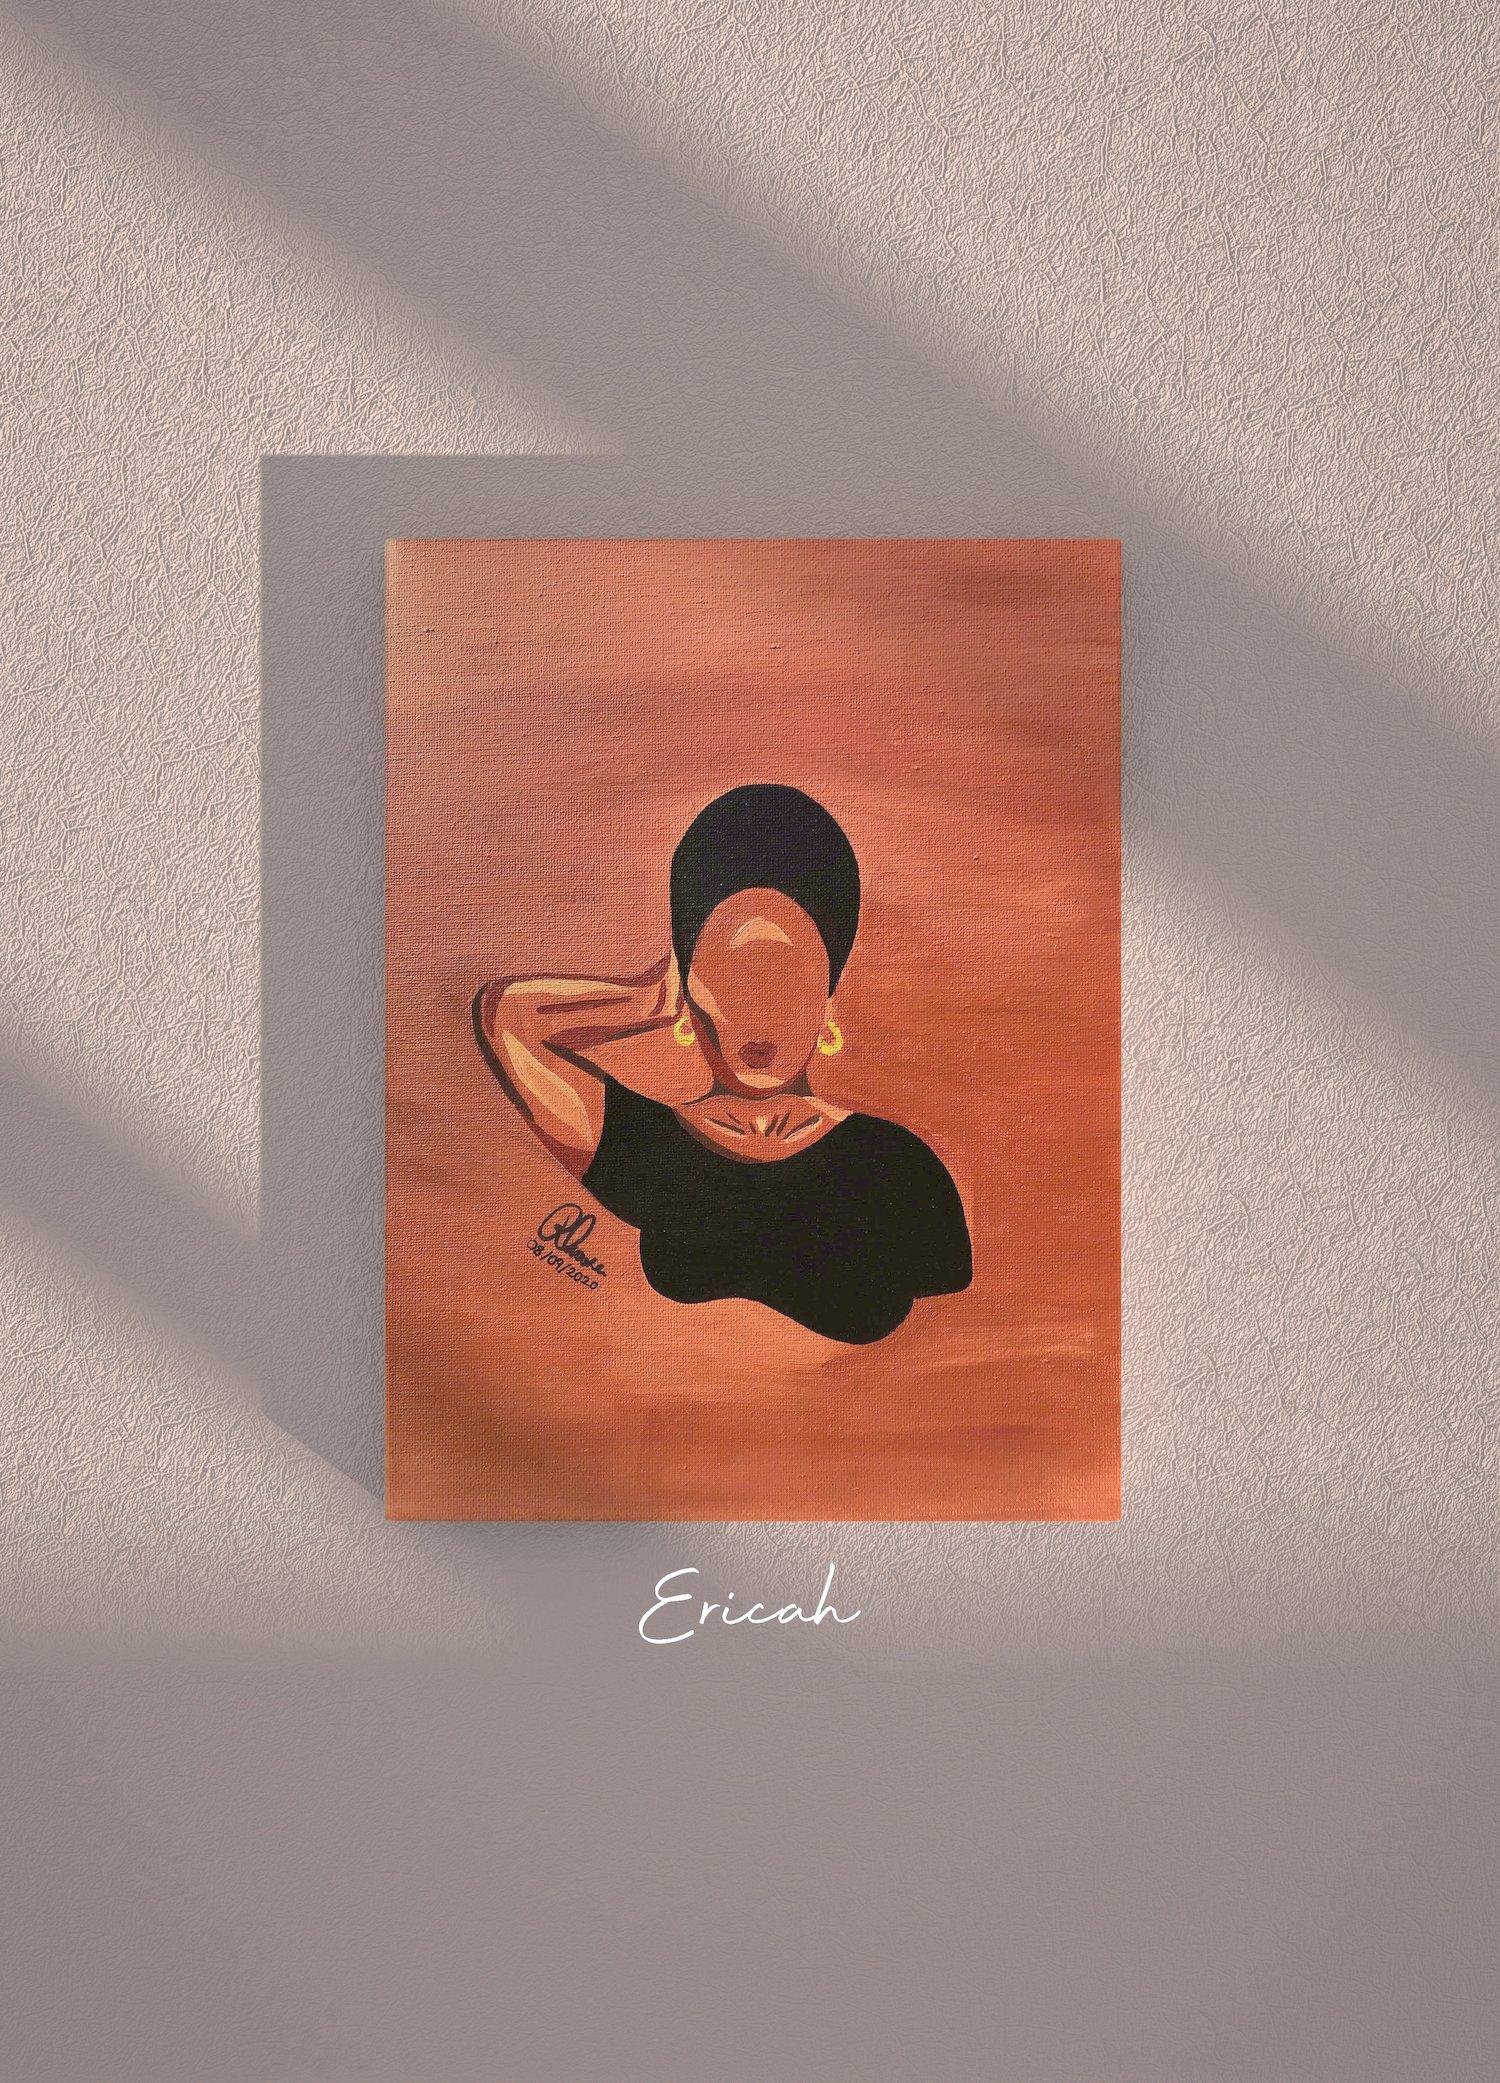 "Image of Ericah | Black Girl Series | Original 9x12"" Acrylic Painting on Canvas"